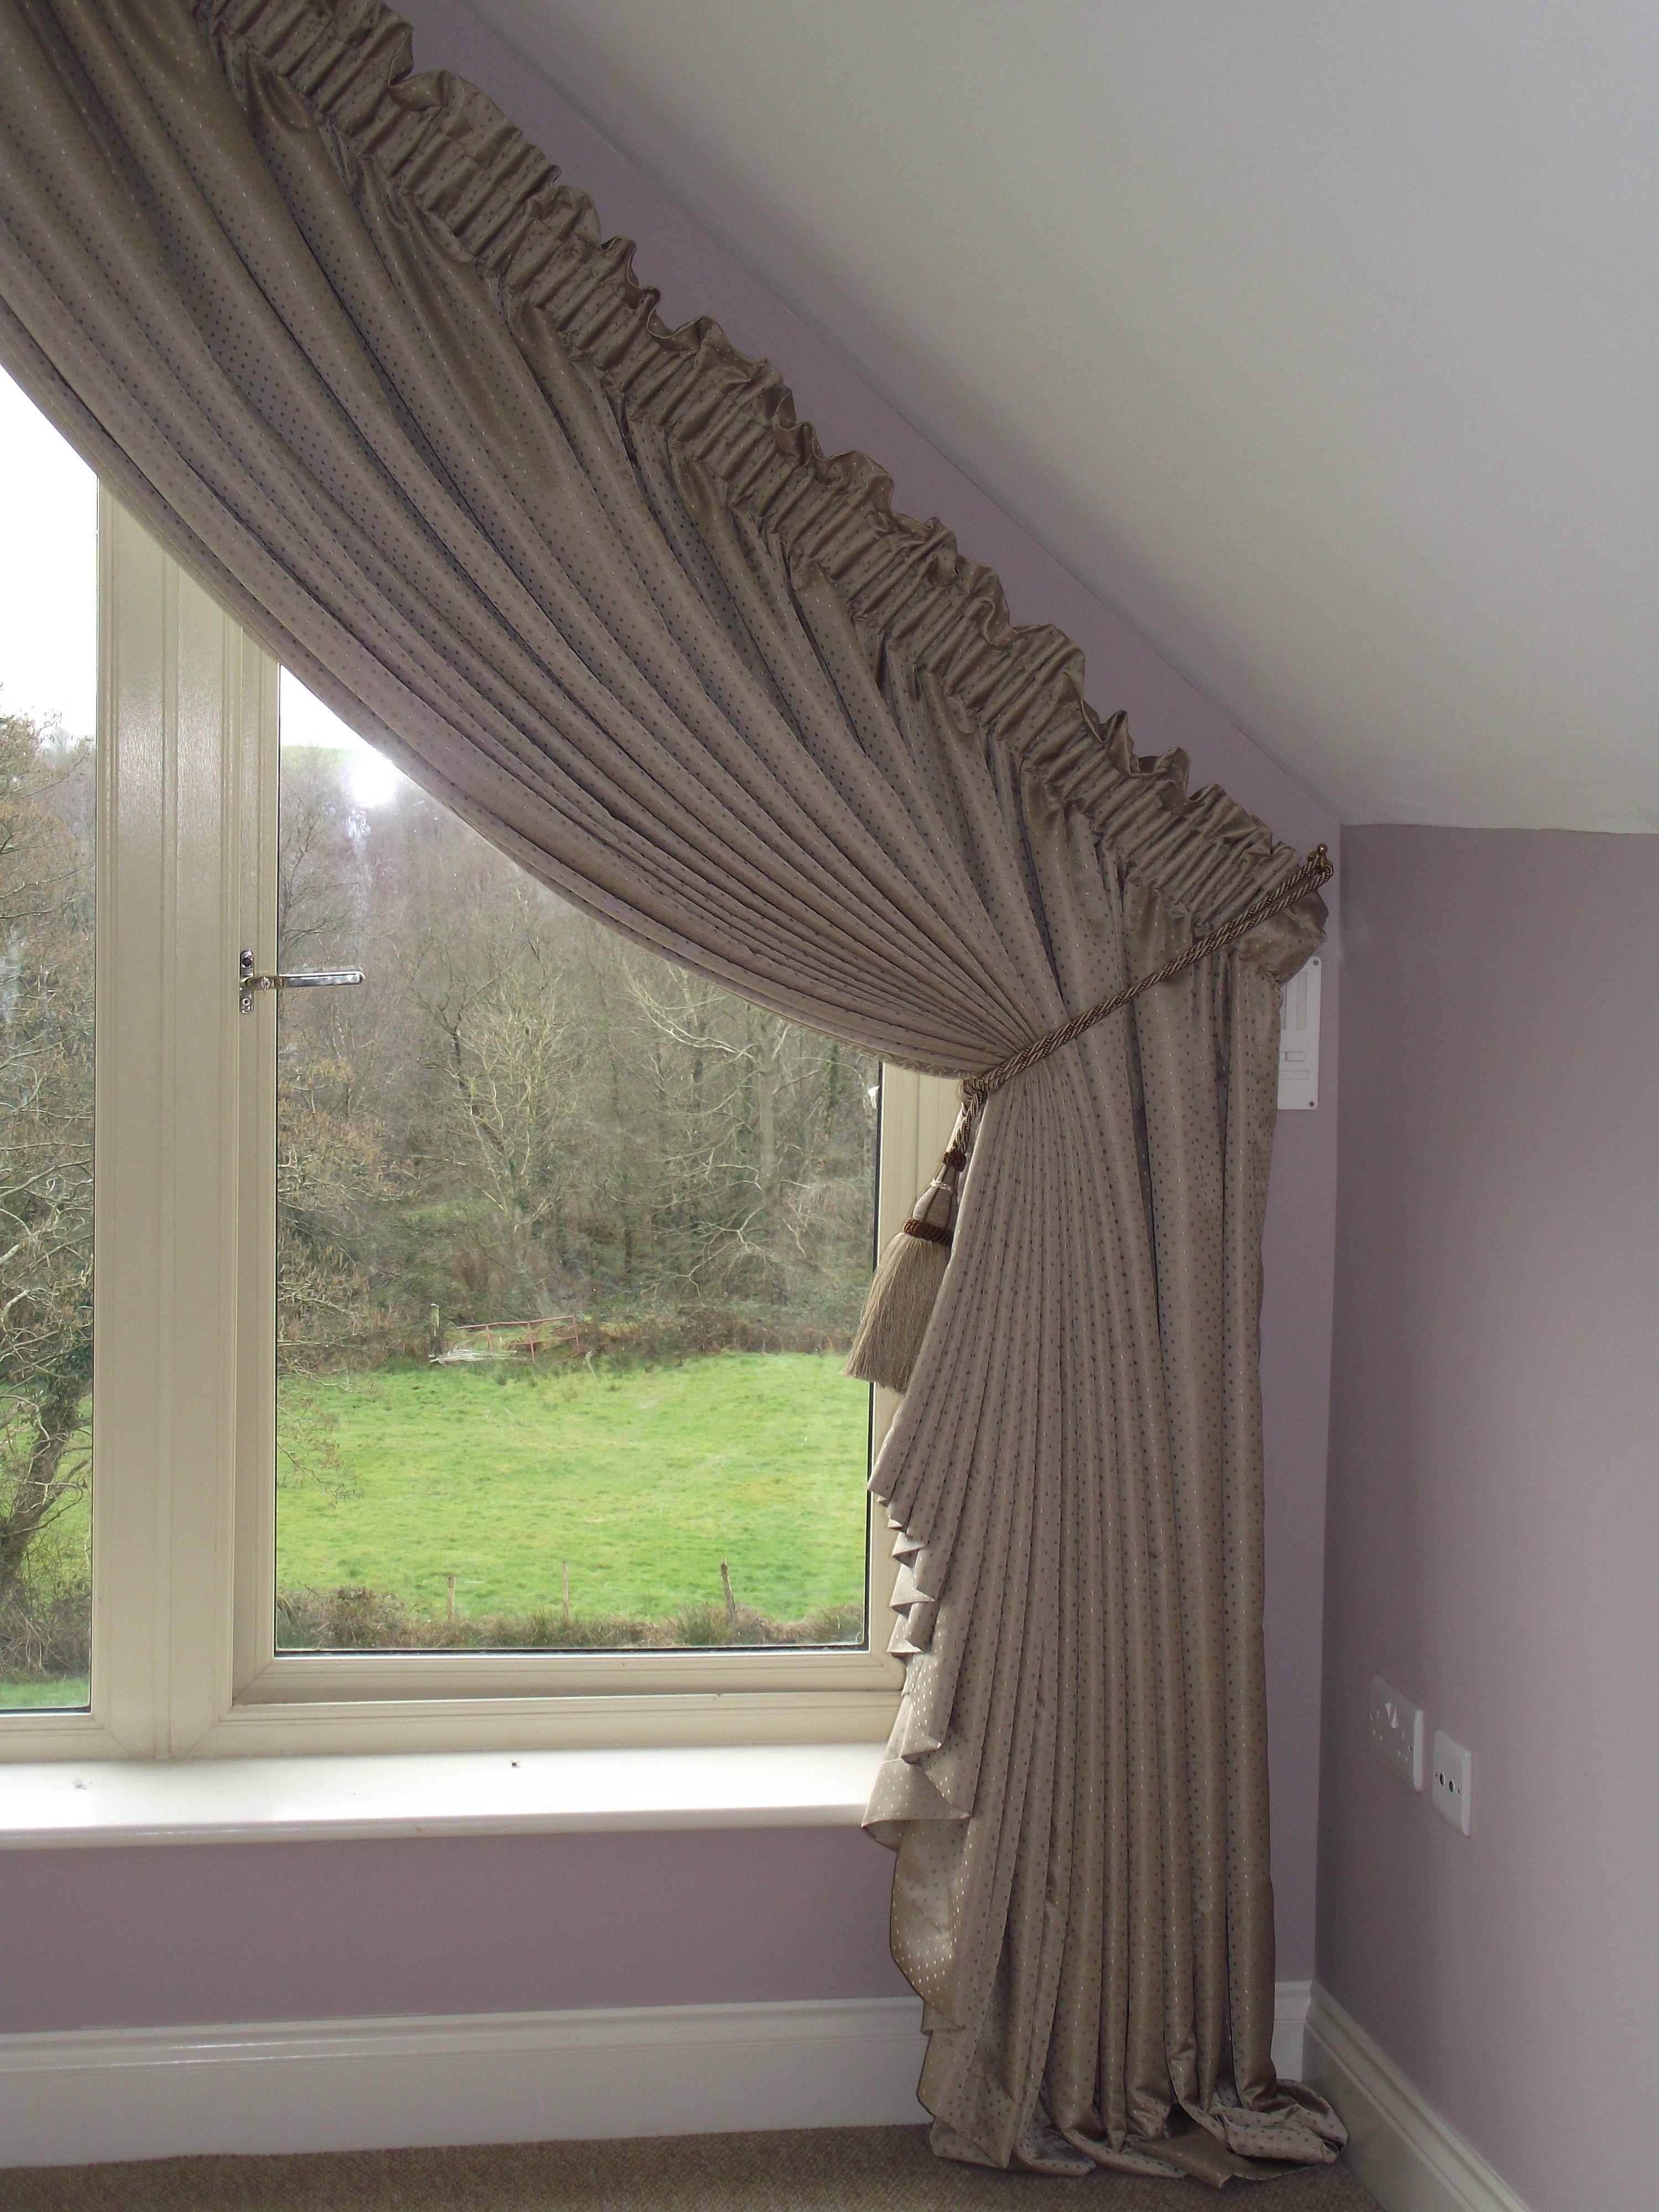 70 Inspirational Curtain Window Photos In 2020 Curtains Window Treatments Curtains Curtain Designs